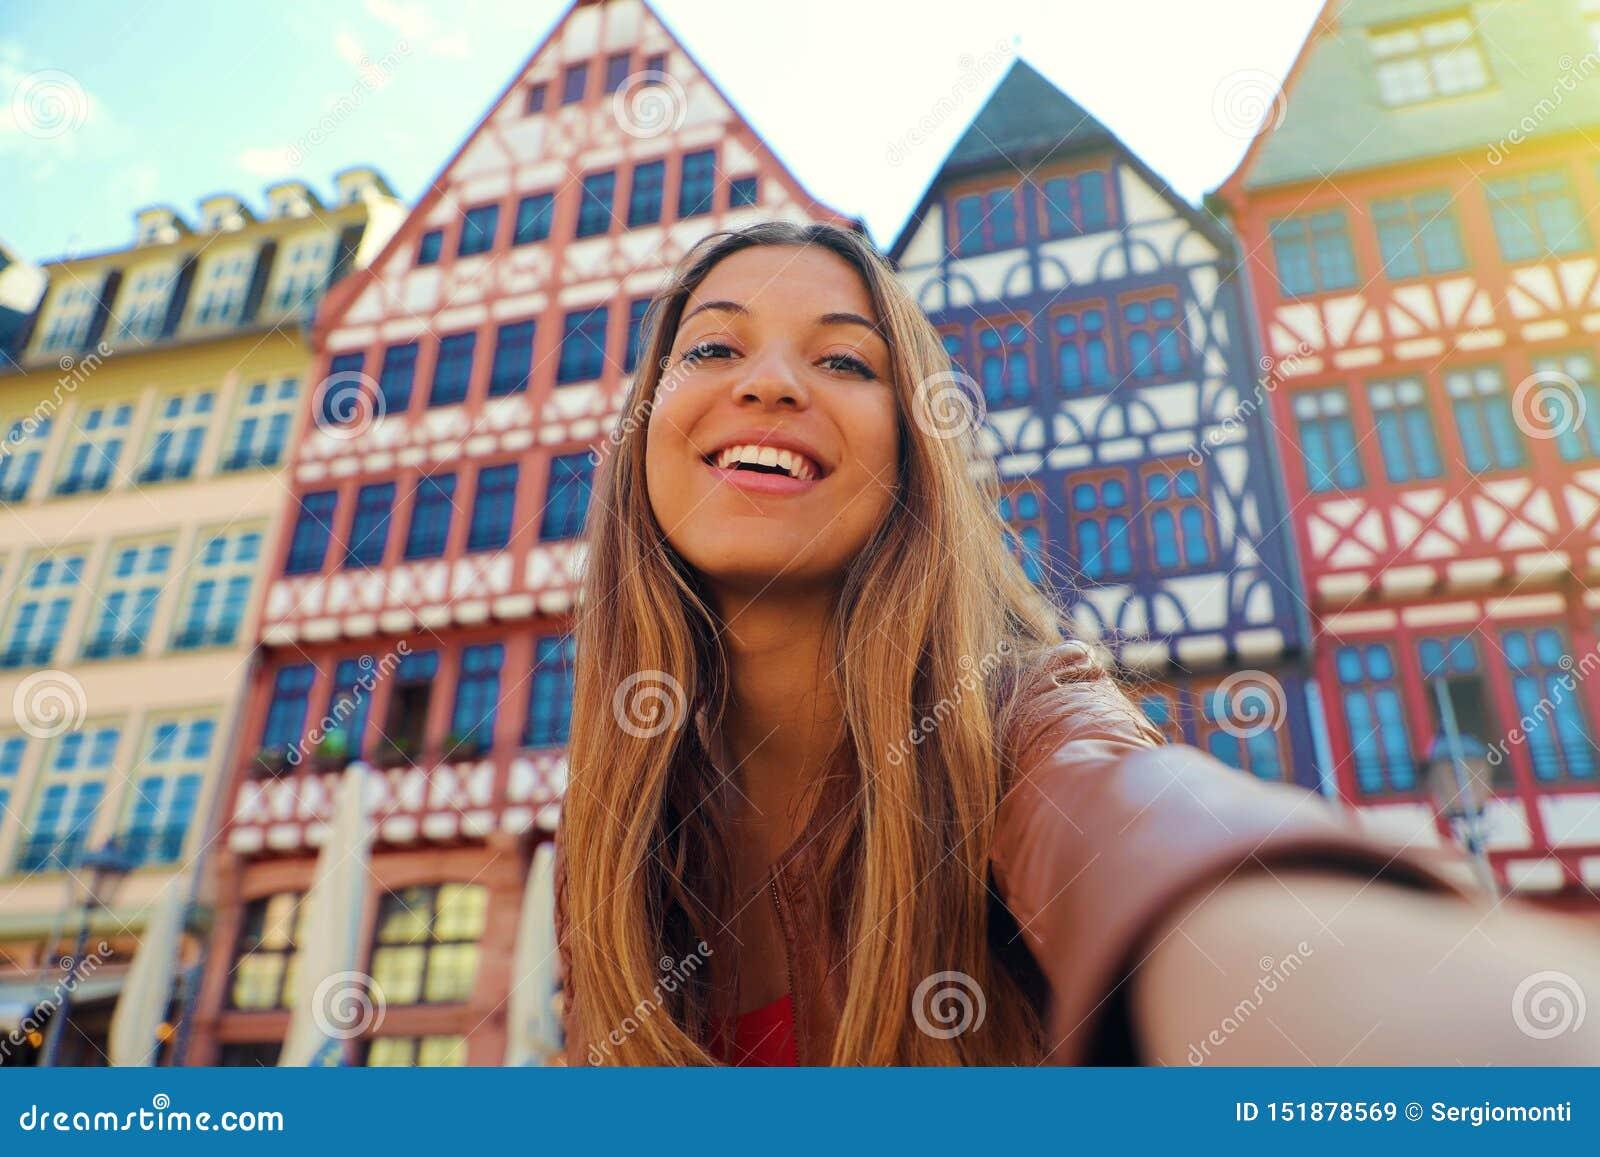 De mooie glimlachende vrouw neemt zelfportret in Romerberg-vierkant in Frankfurt, Duitsland